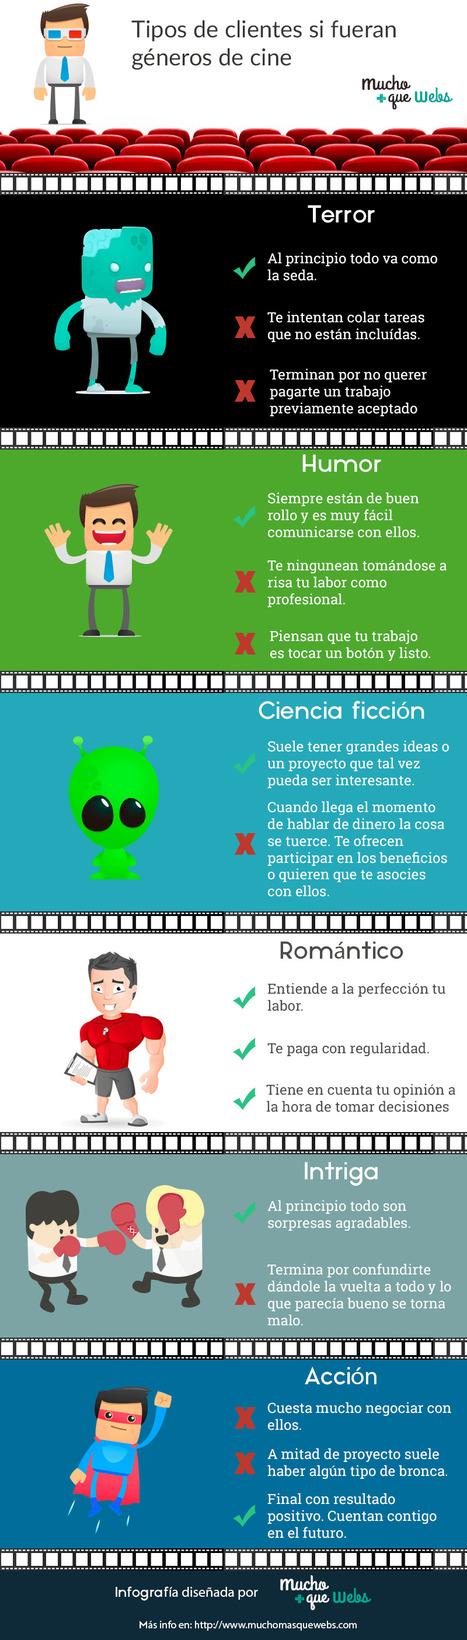 Tipos de clientes si fueran géneros de cine | Infografias | Scoop.it